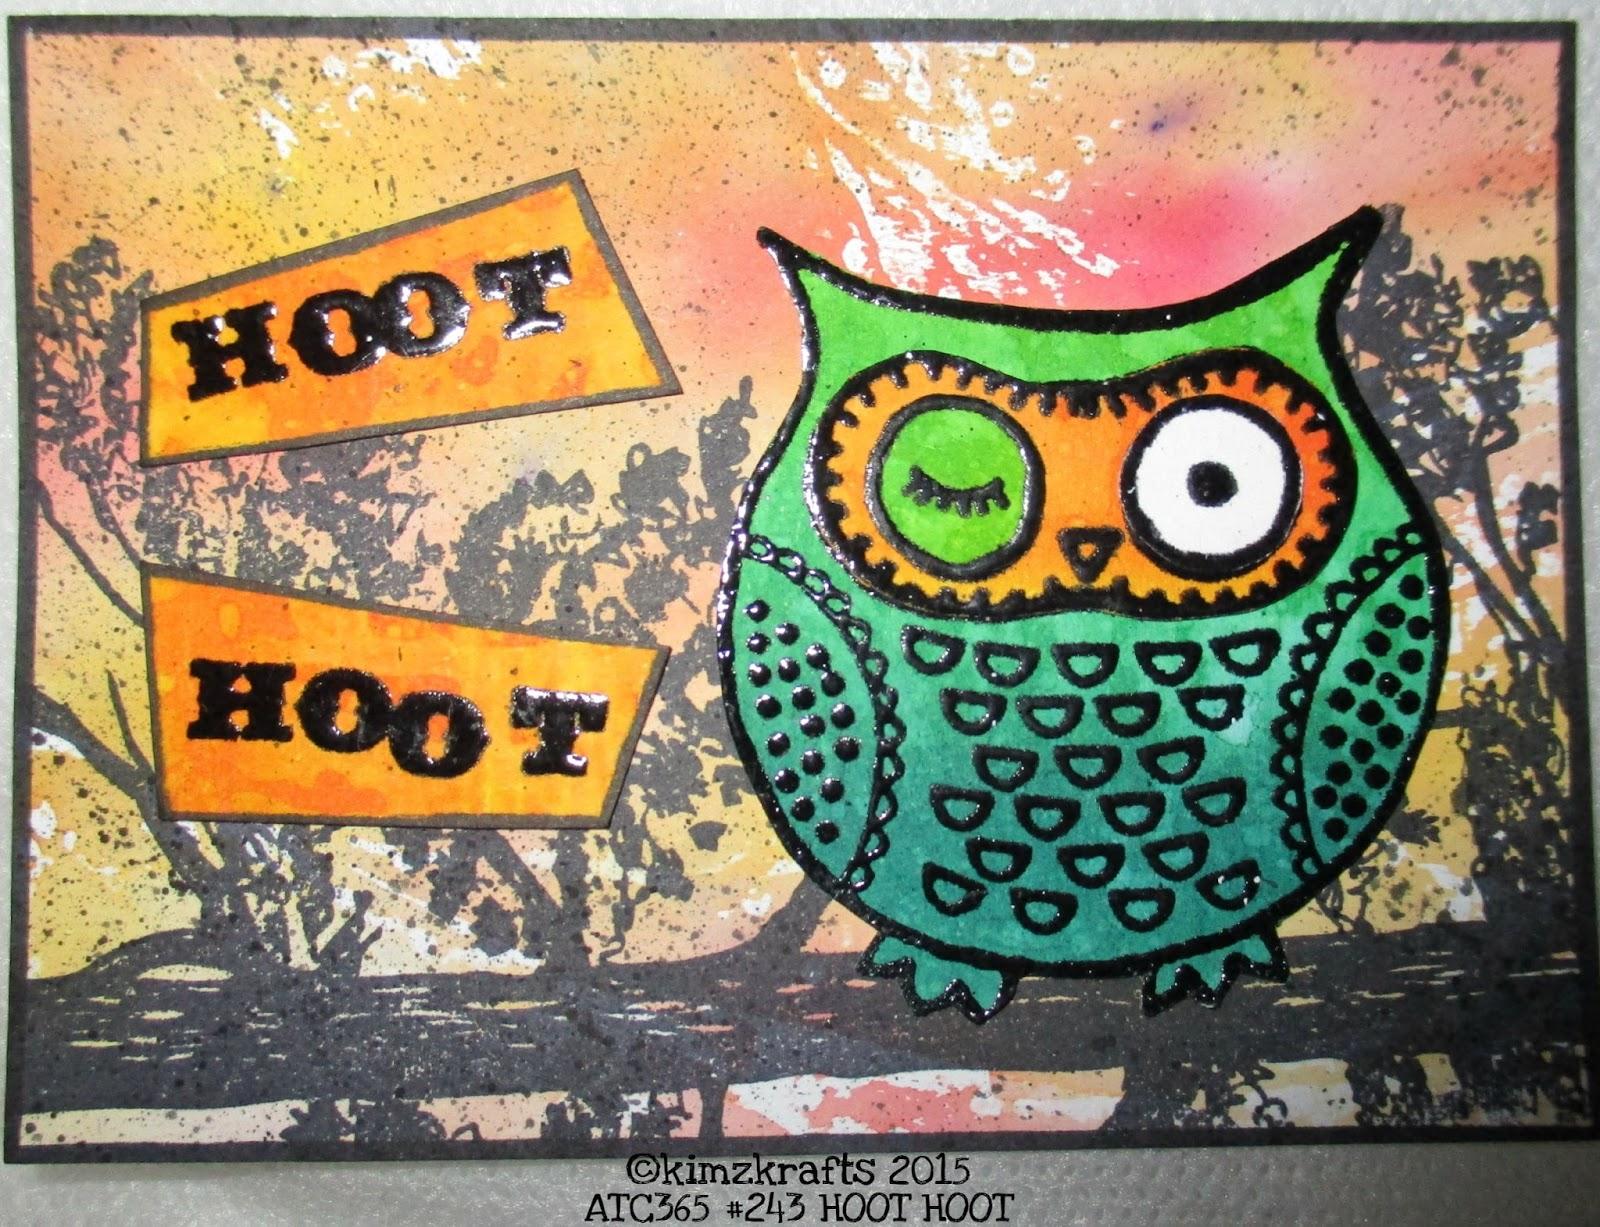 Kimzkrafts Atc365 243 Hoot Hoot